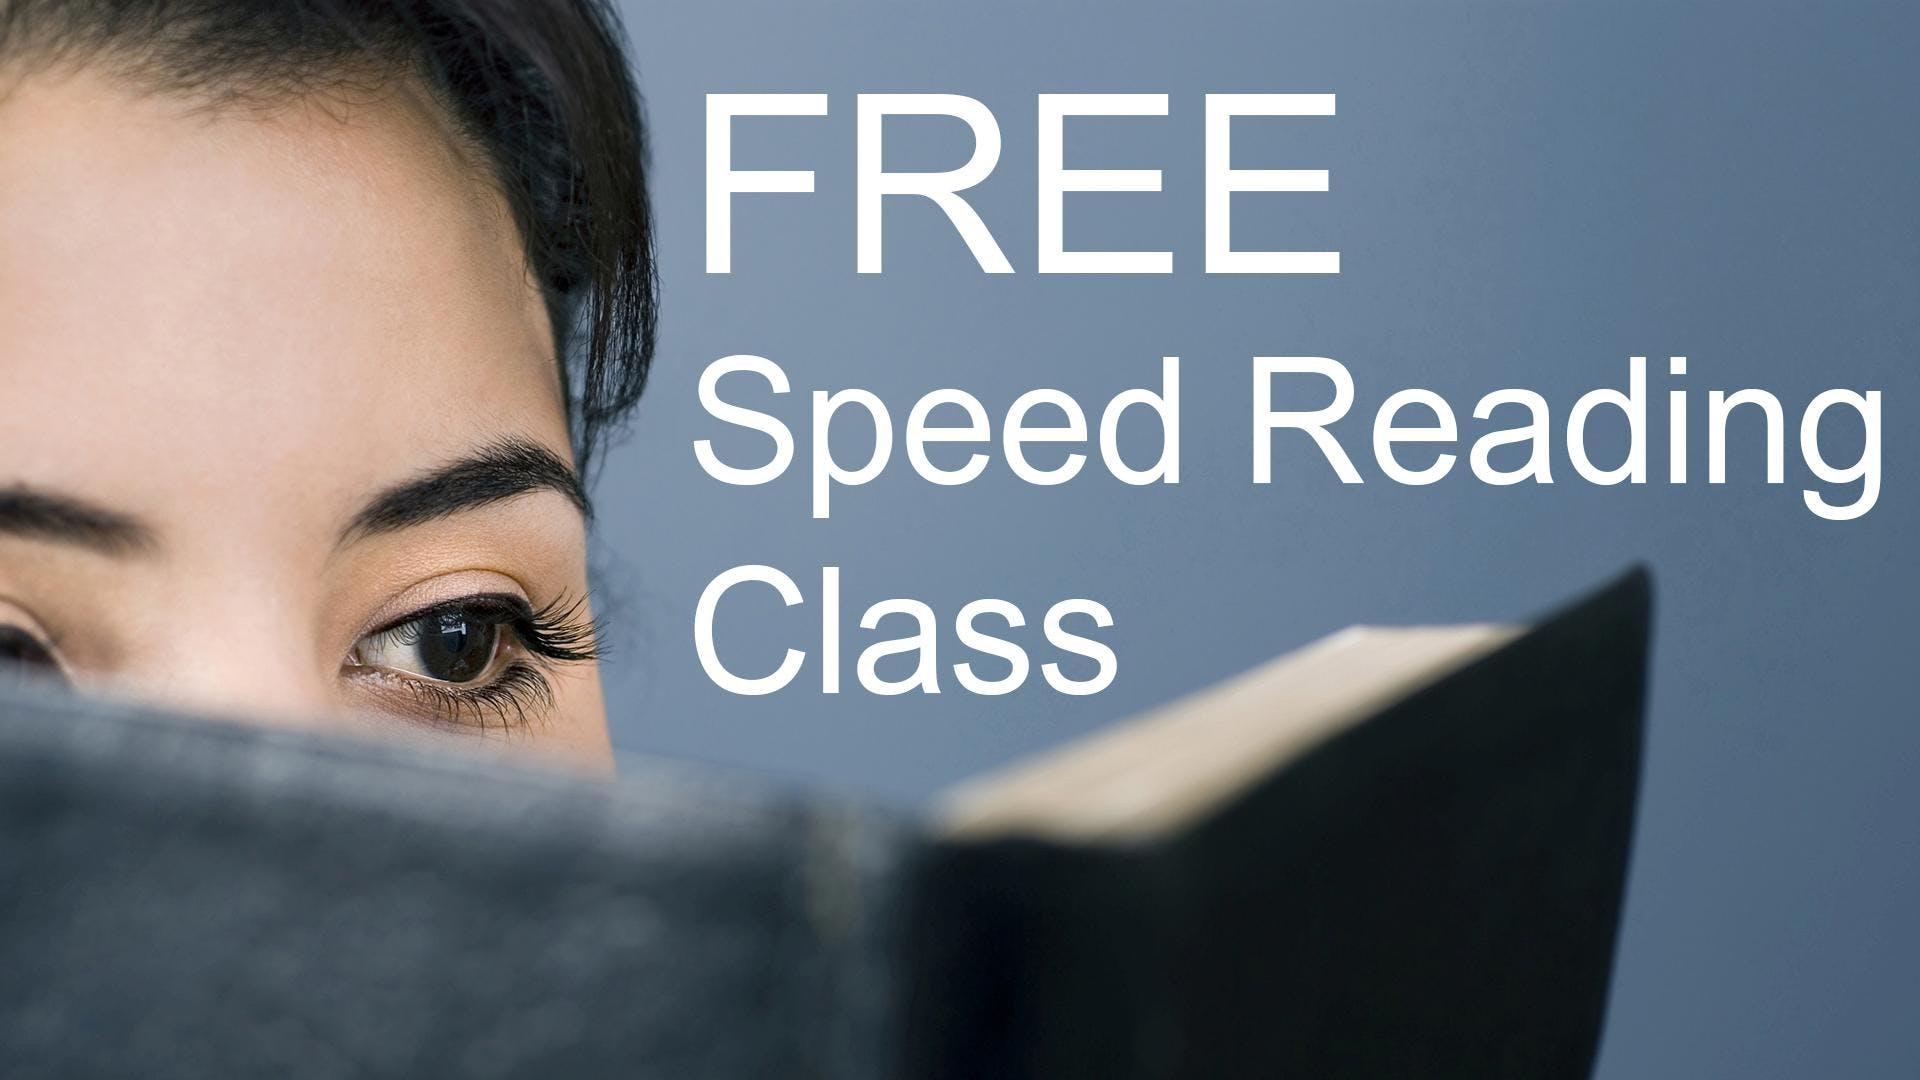 Free Speed Reading Class - Fayetteville